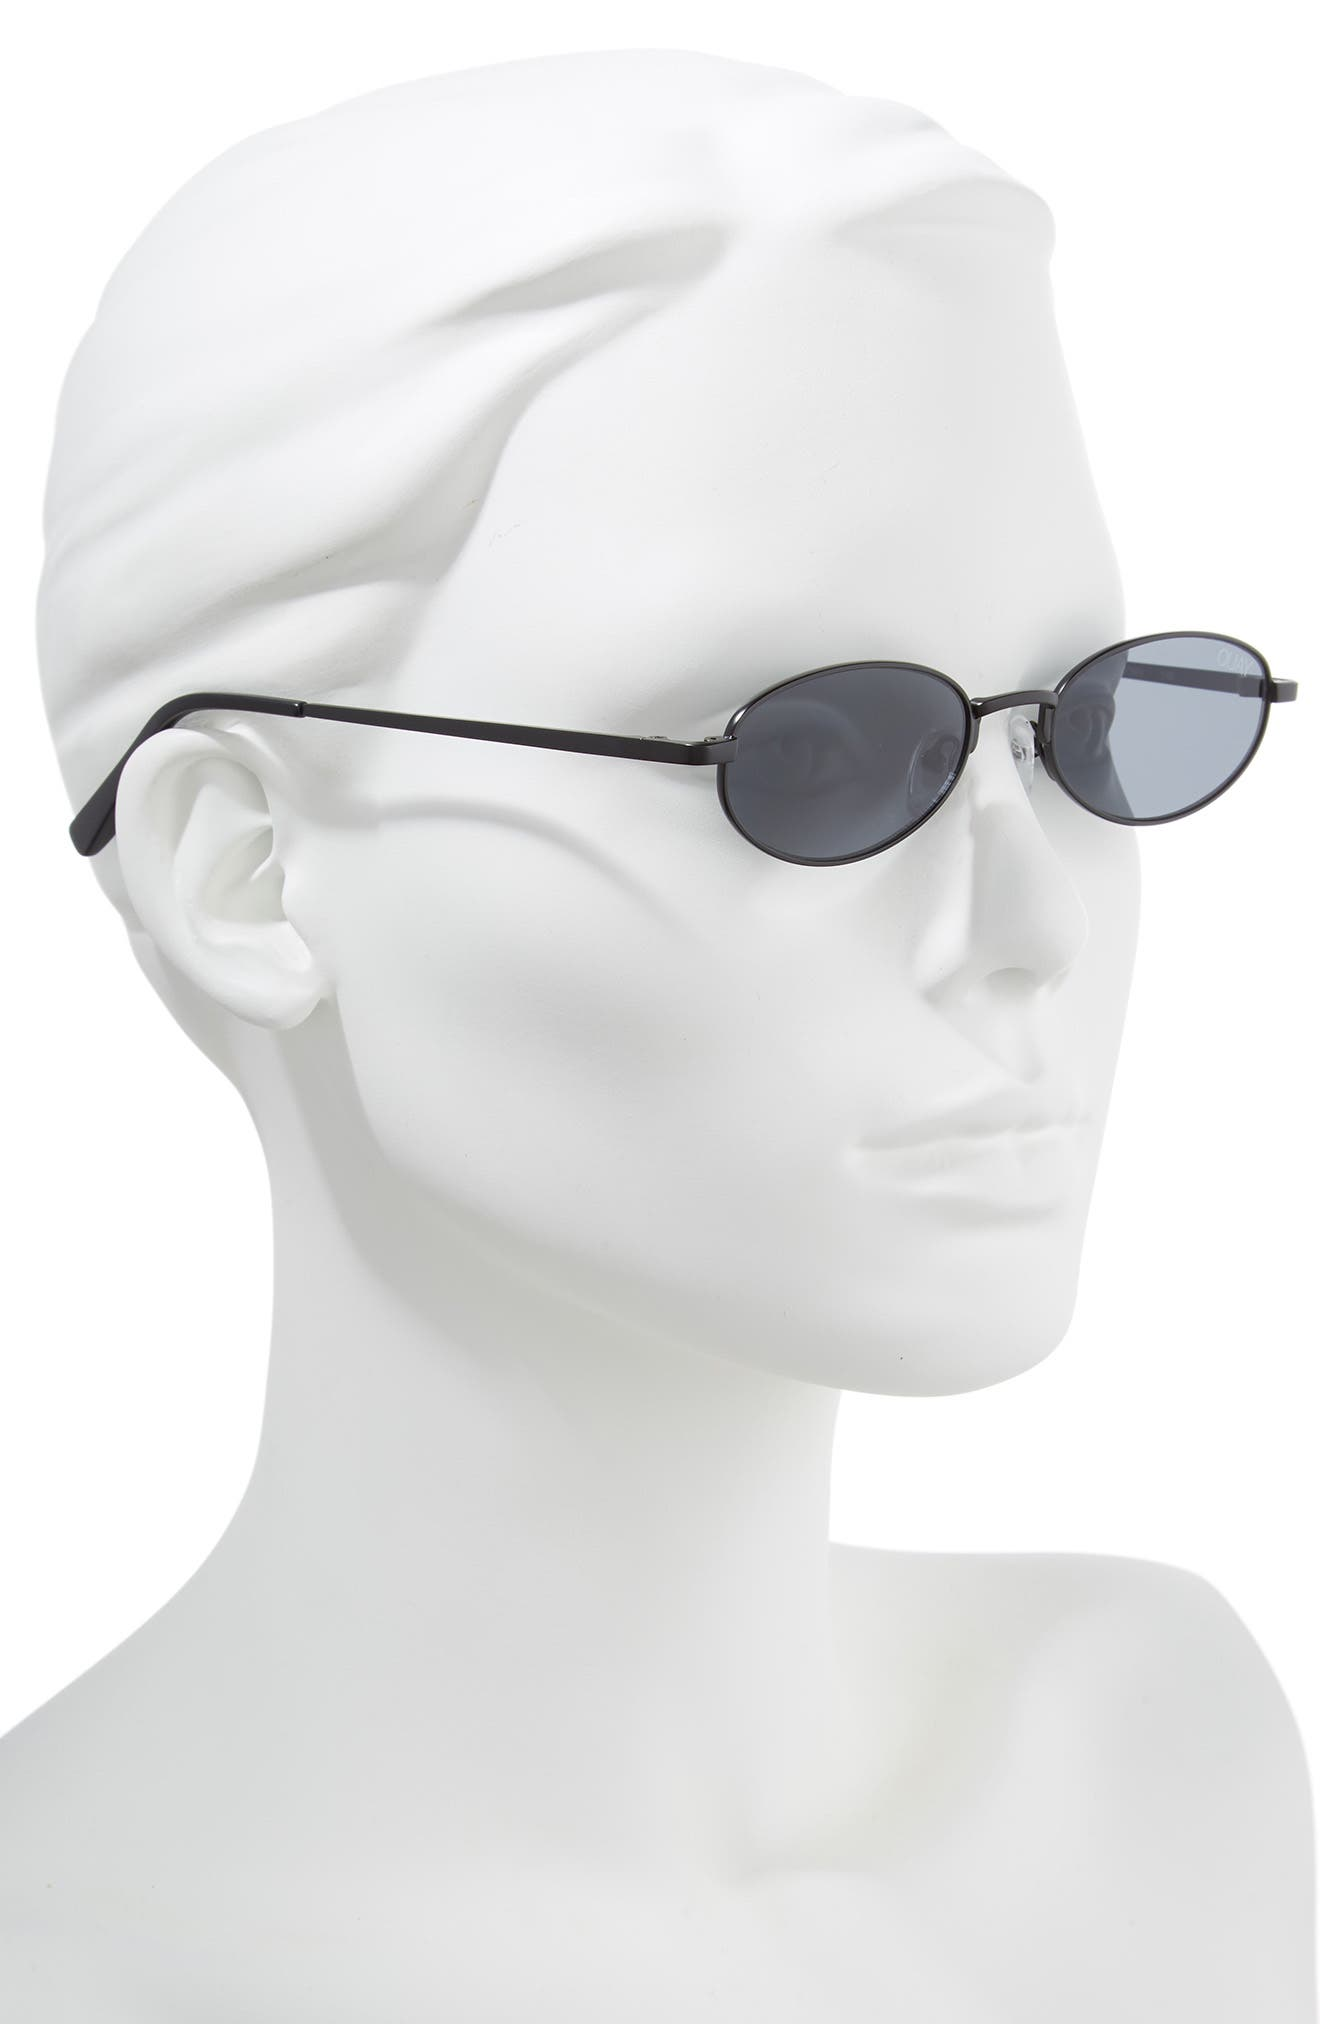 49mm Showdown Oval Sunglasses,                             Alternate thumbnail 2, color,                             BLACK/ SMOKE